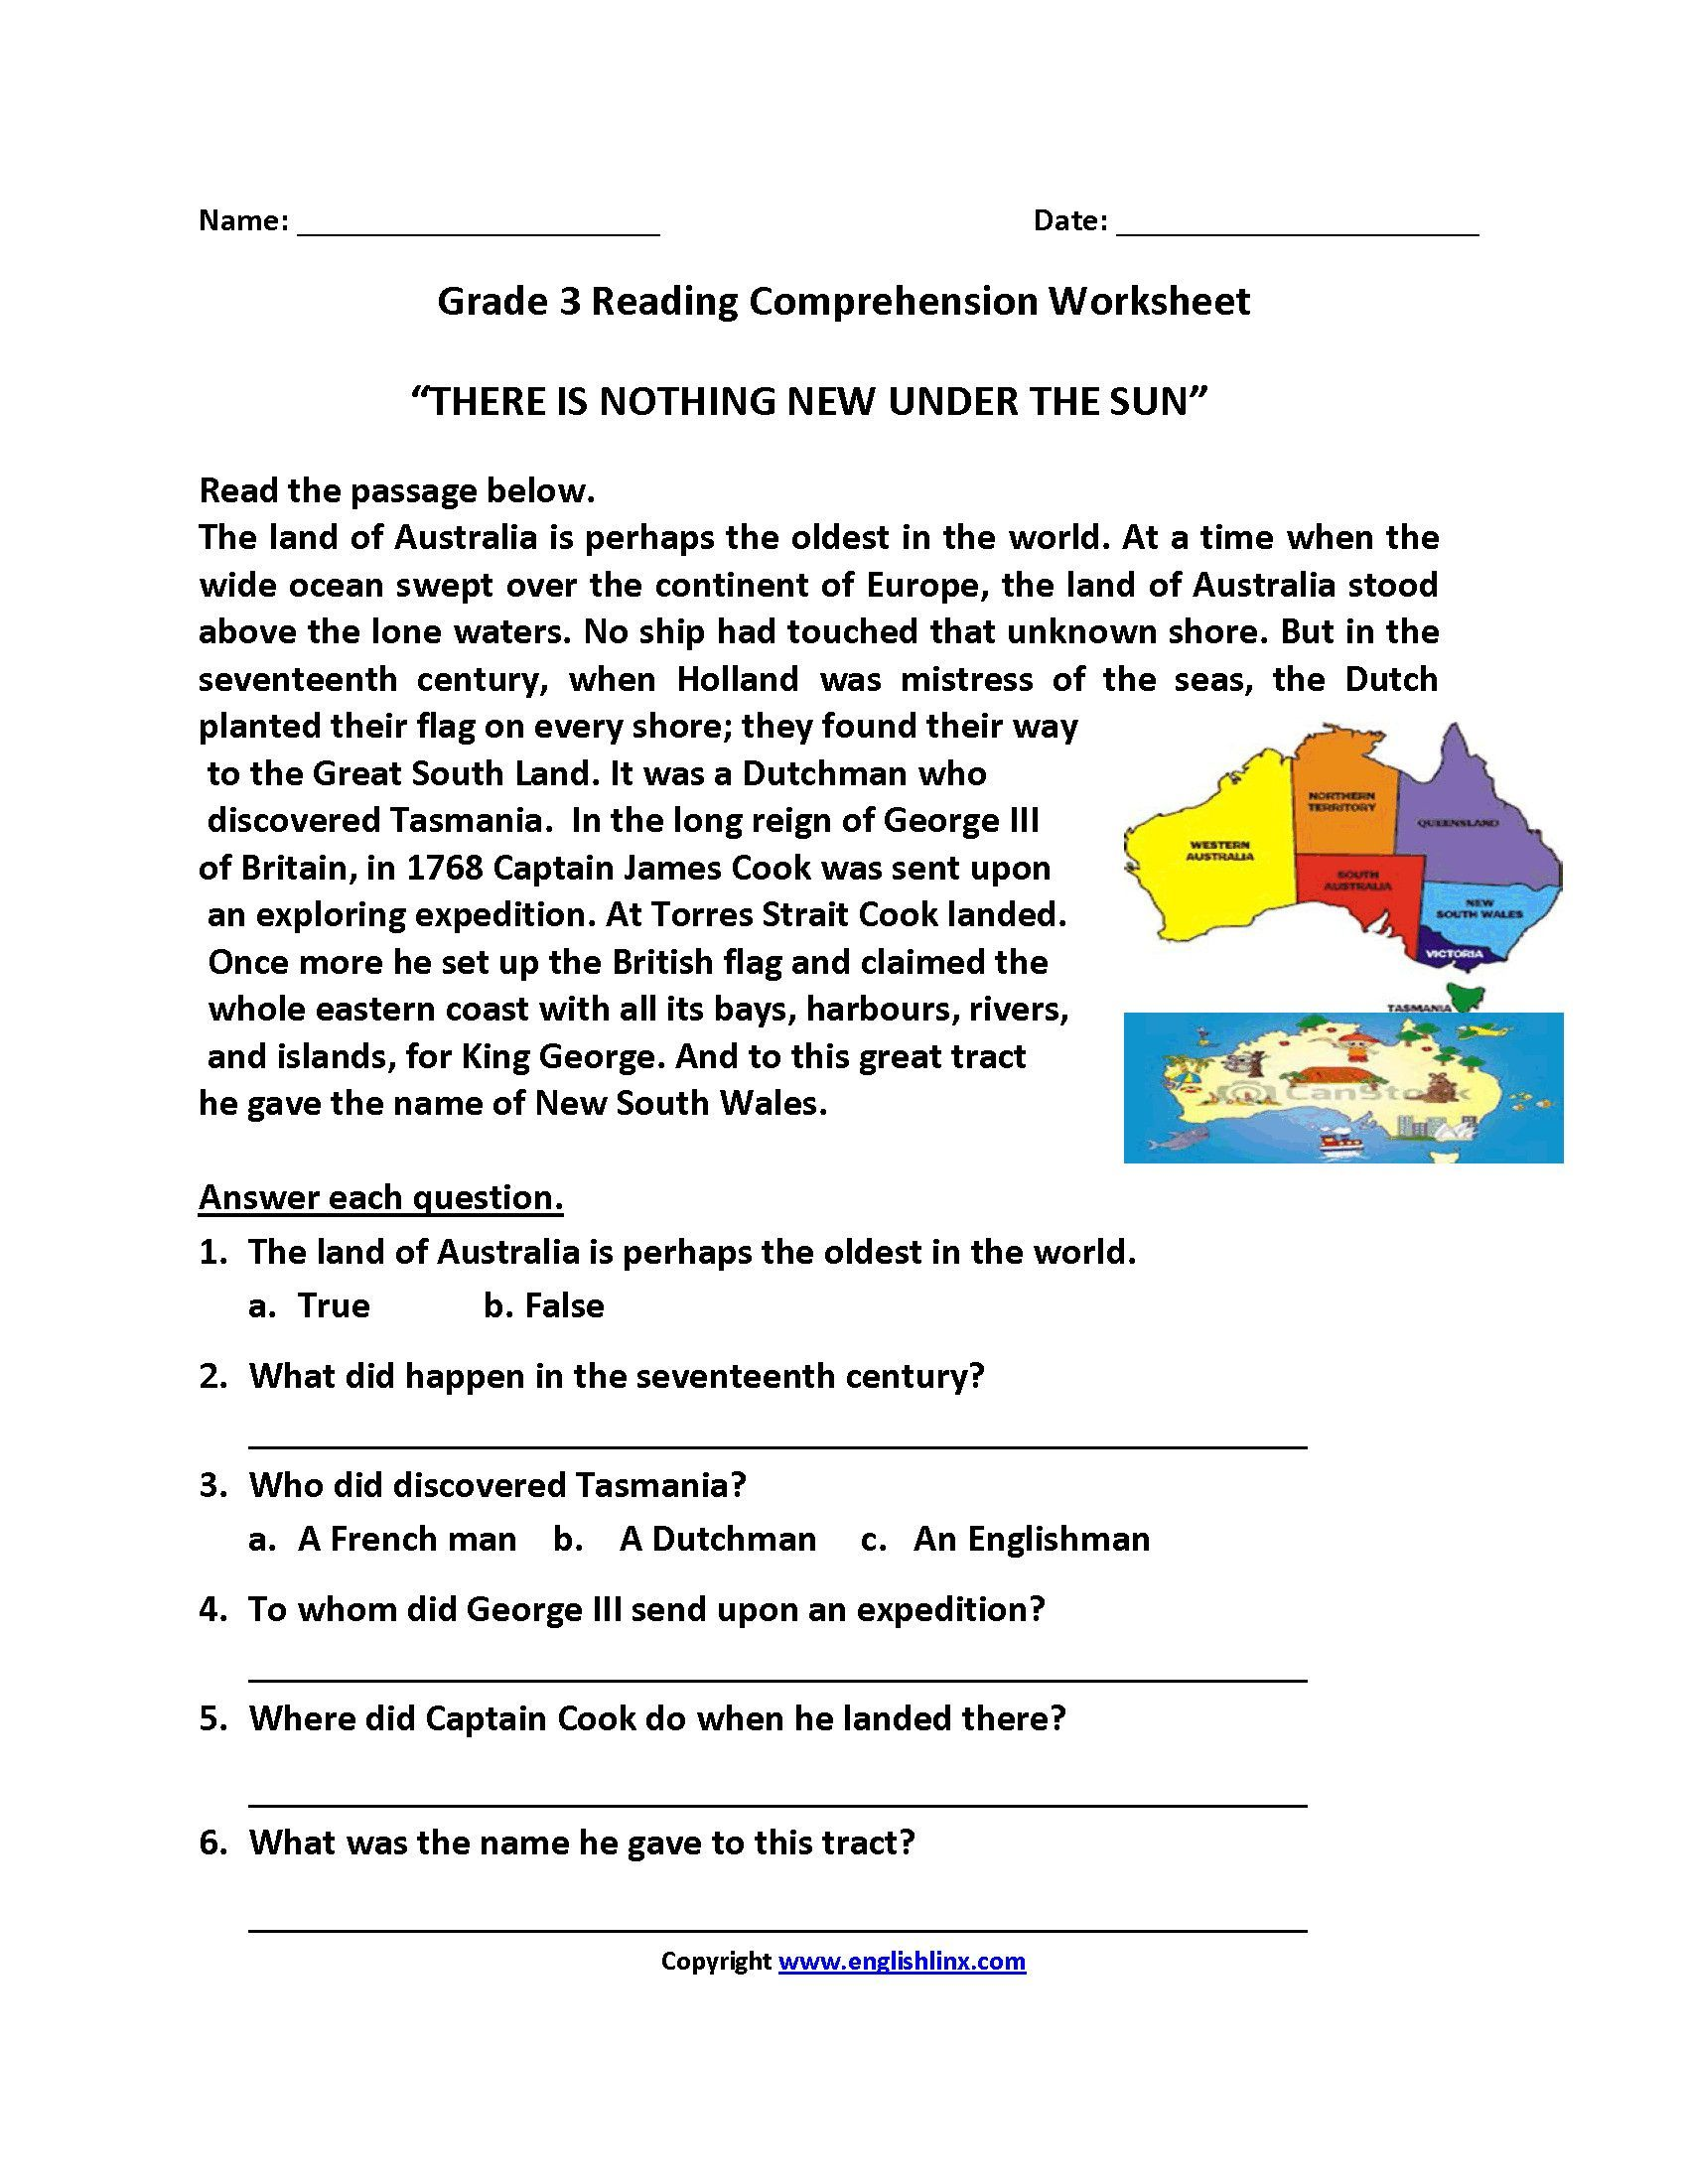 - 38 Innovative Reading Comprehension Worksheets Design Ideas